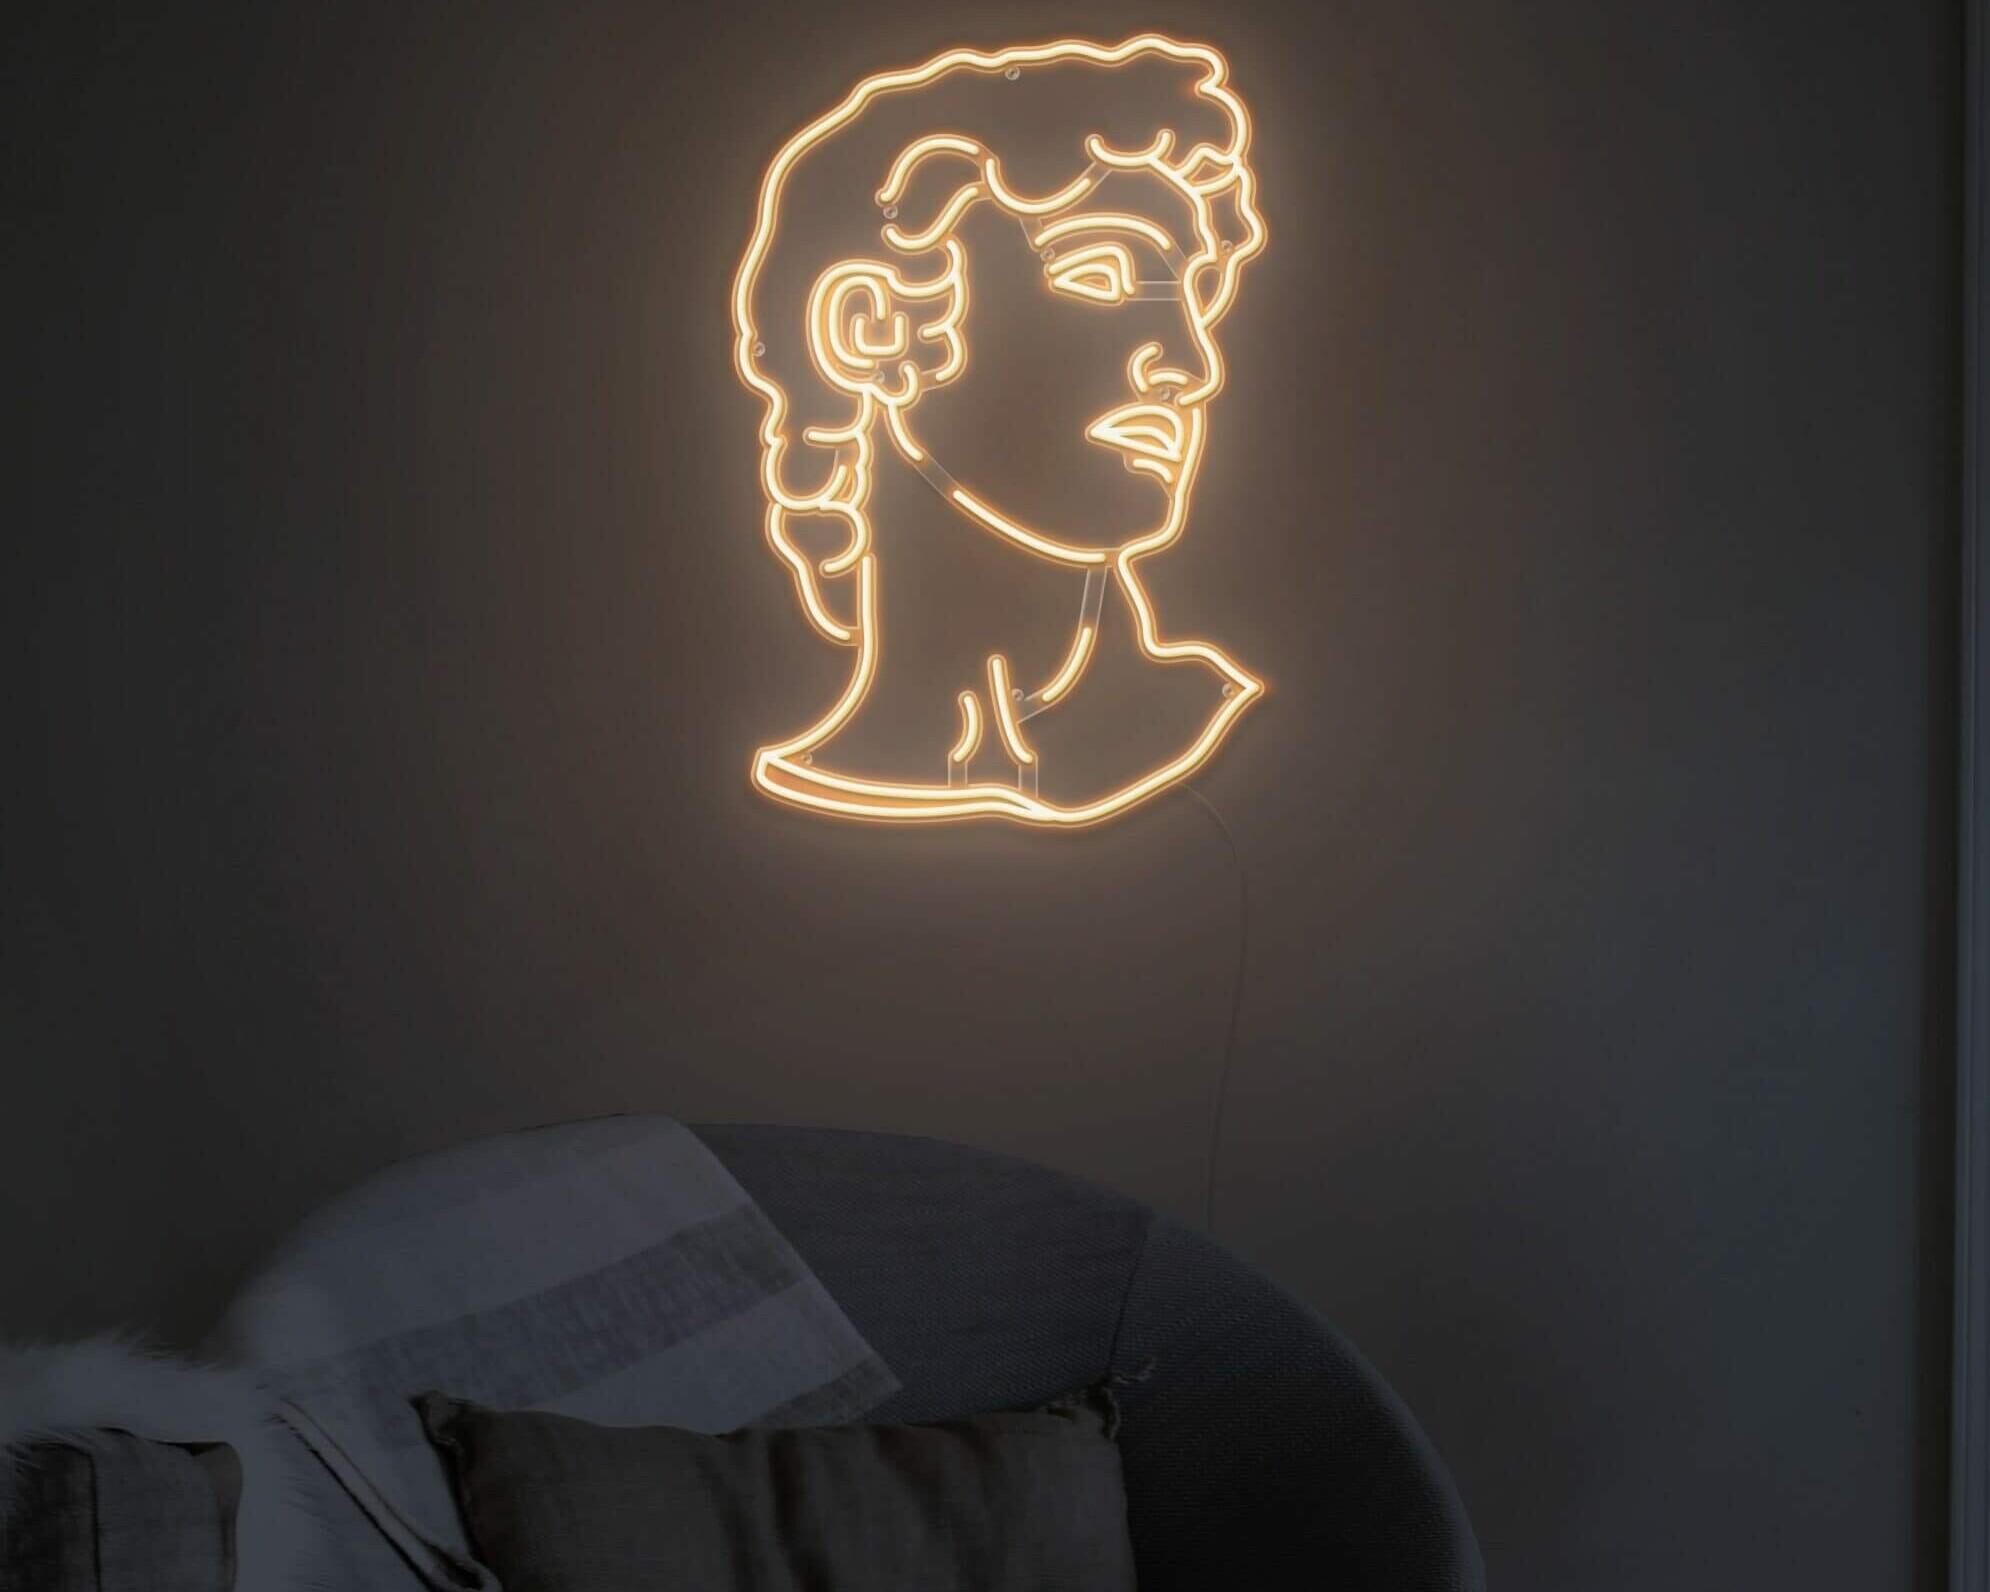 david head led neon light